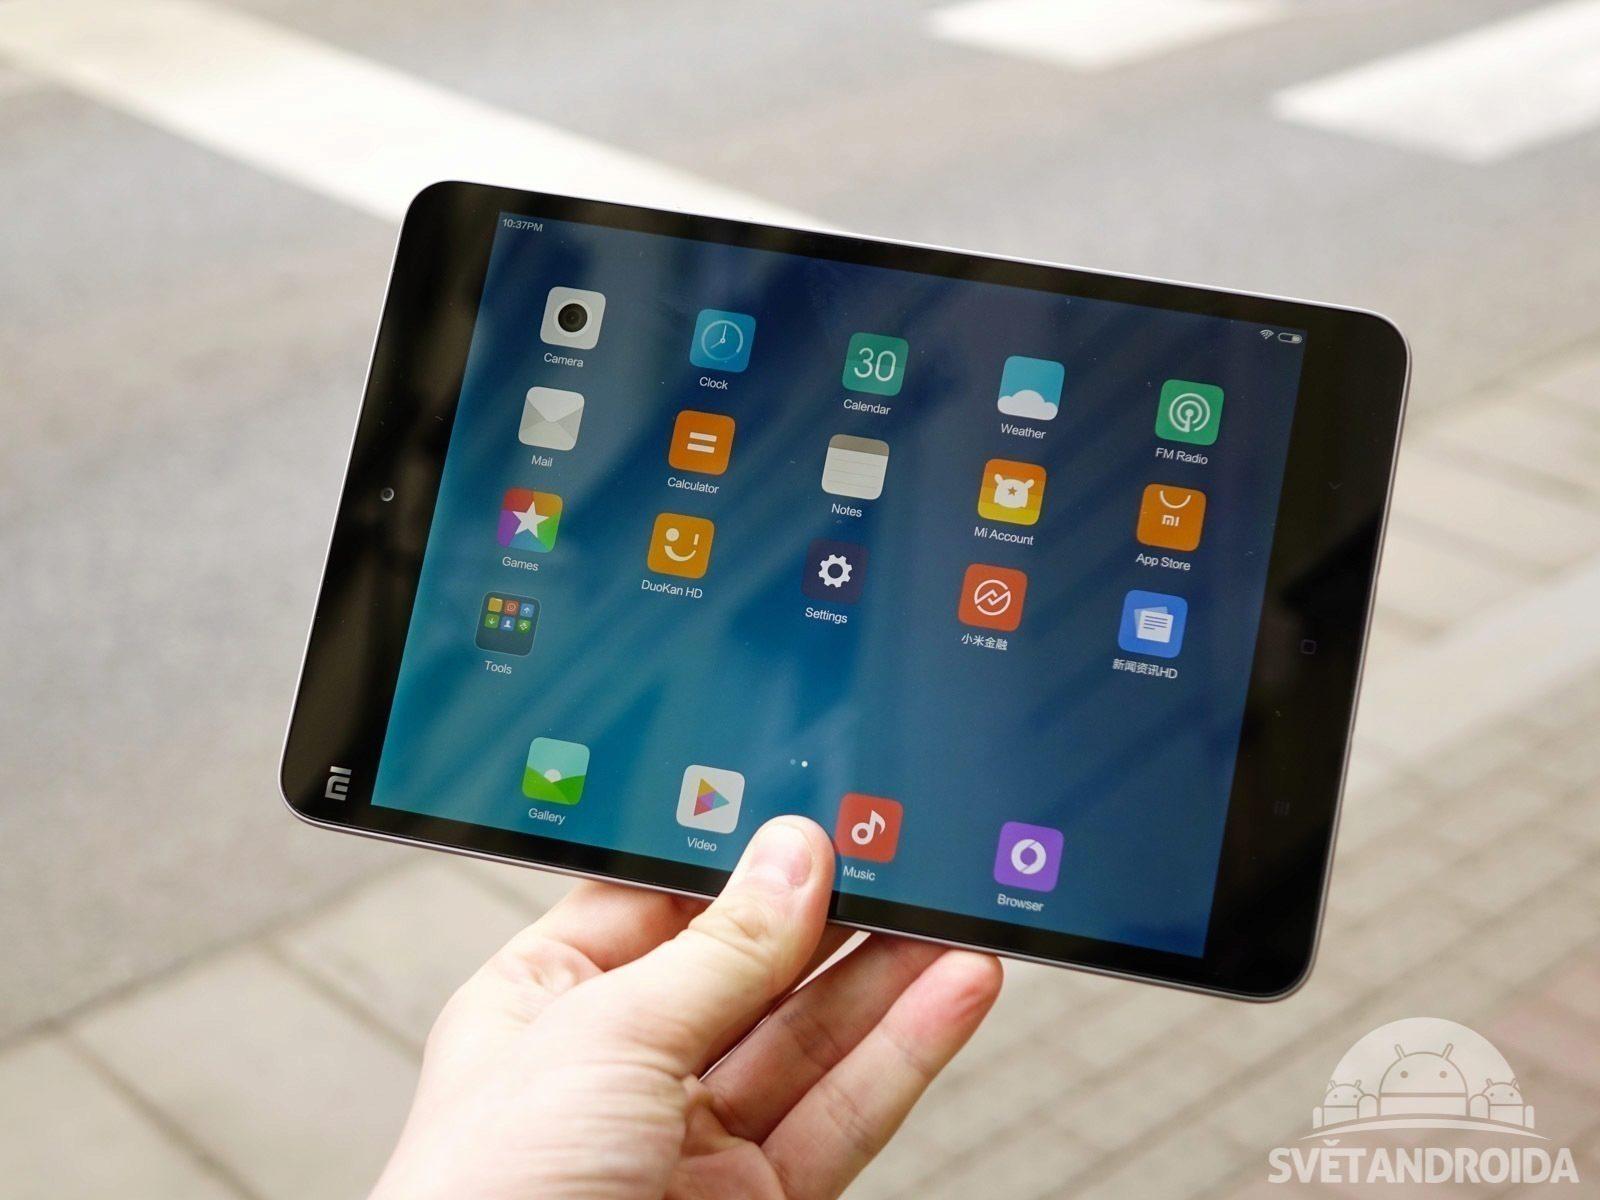 Xiaomi Mi Pad 2 konstrukce držen v ruce